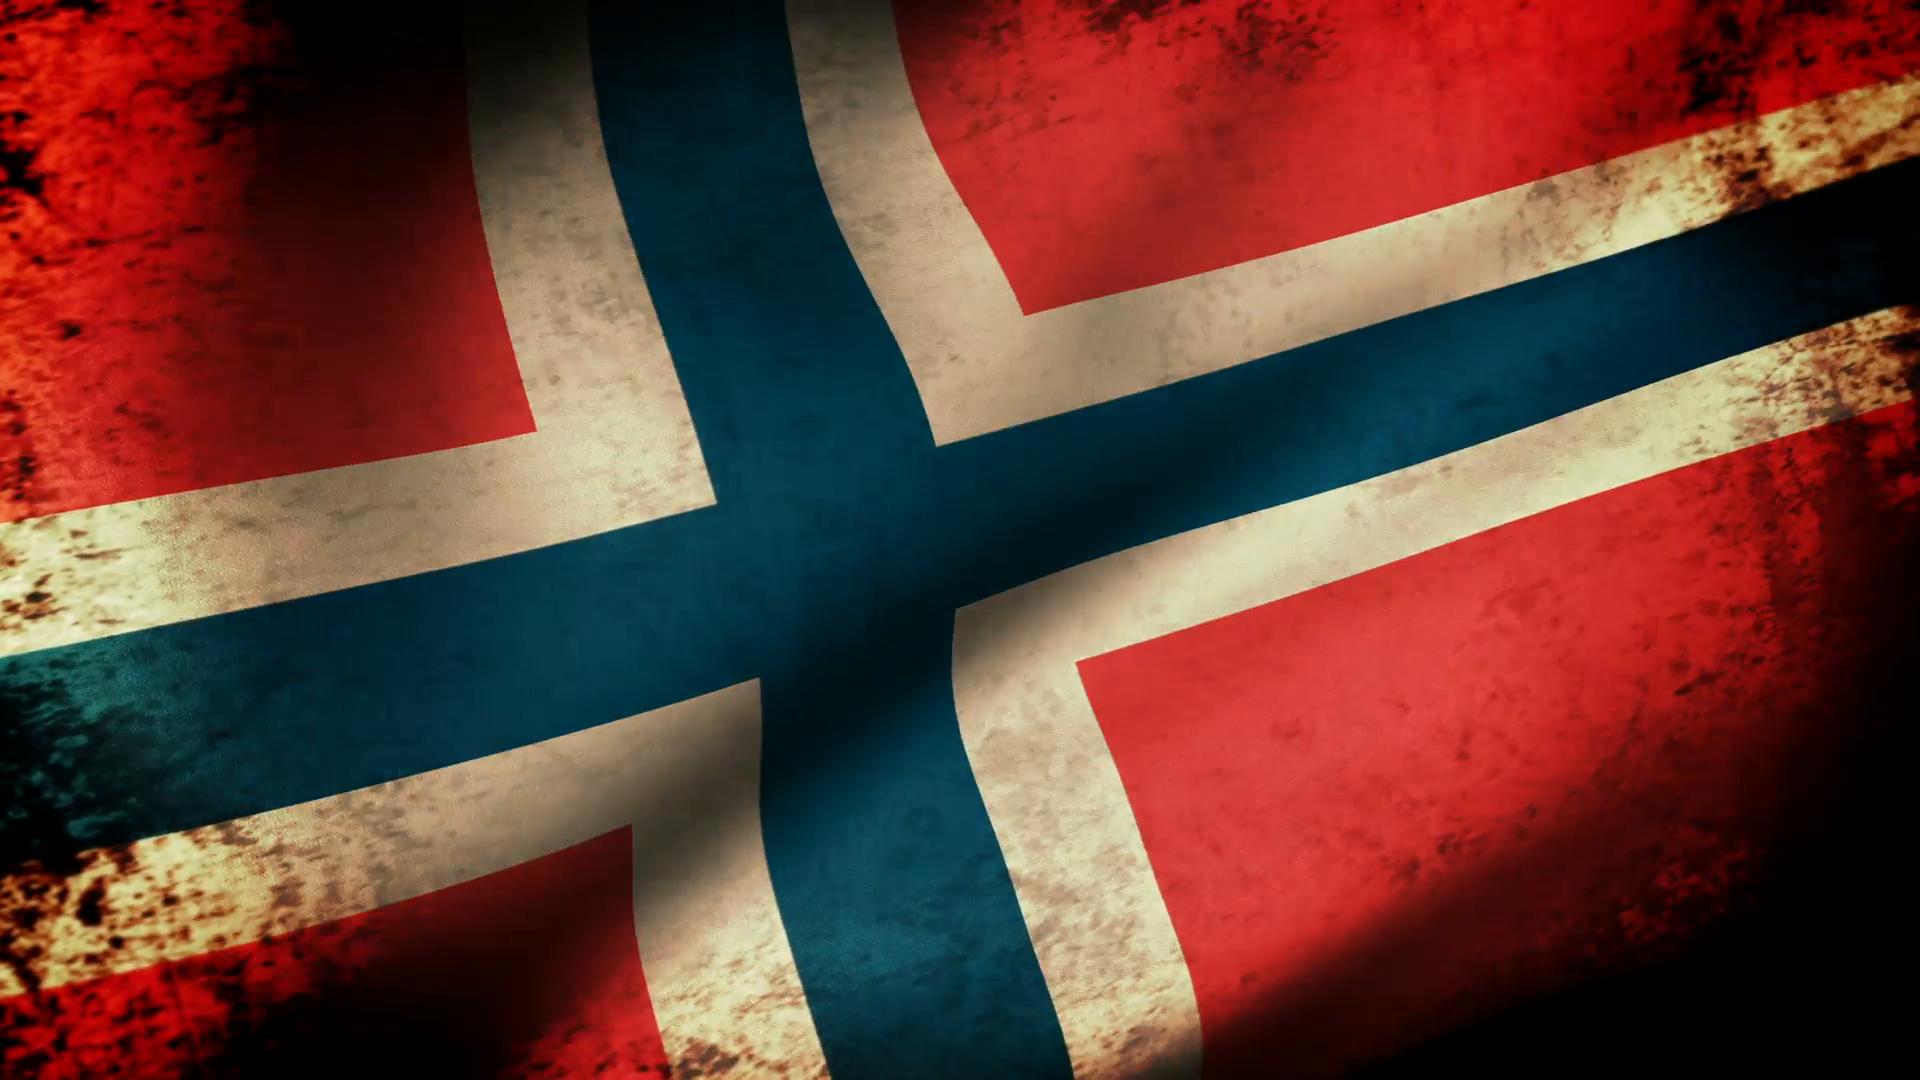 Norway Flag Waving, grunge look Motion Background - VideoBlocks